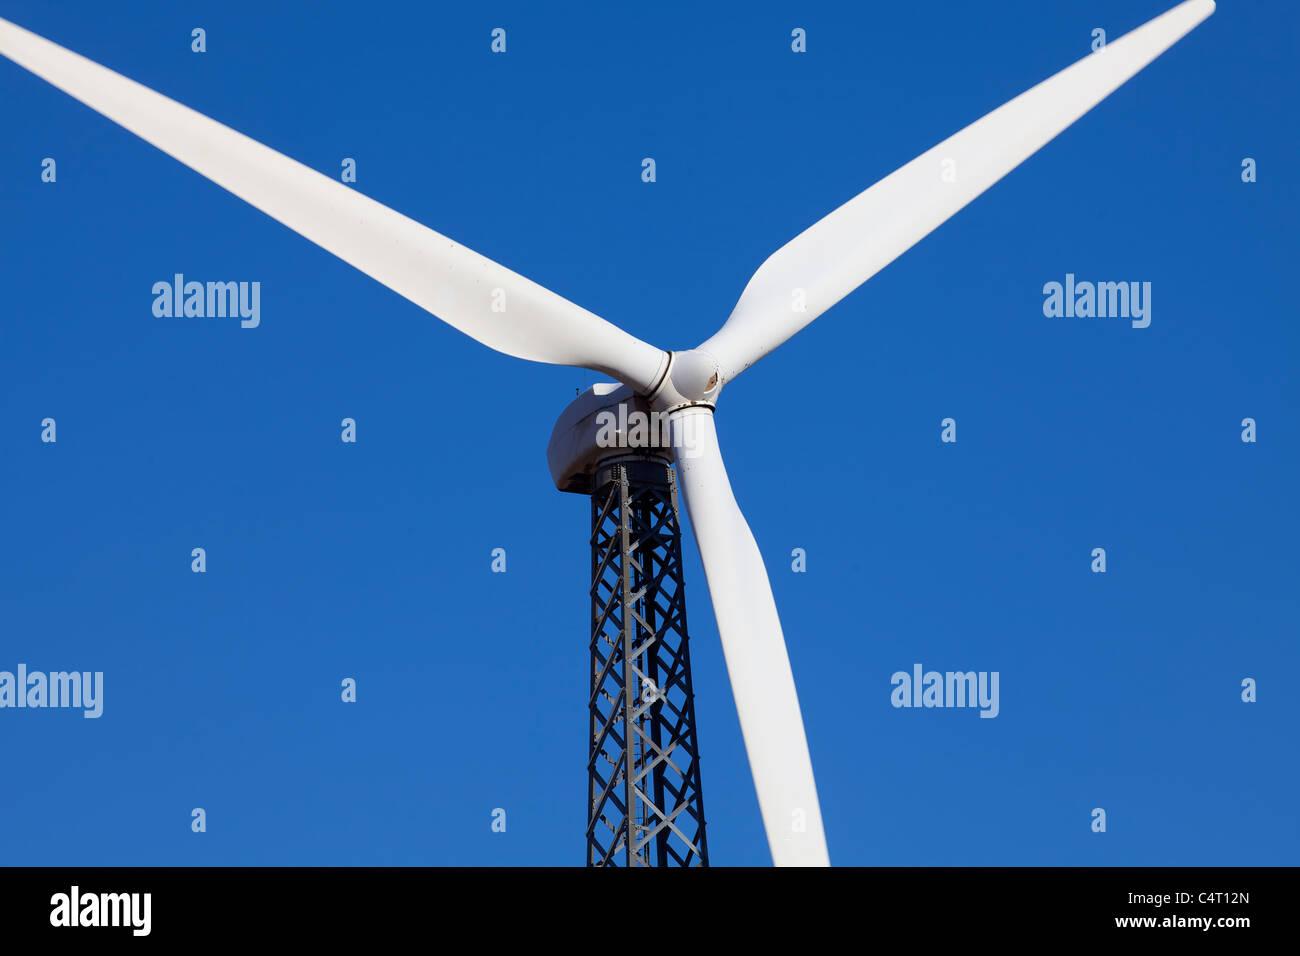 Wind Turbine for Alternative Energy Production - Stock Image